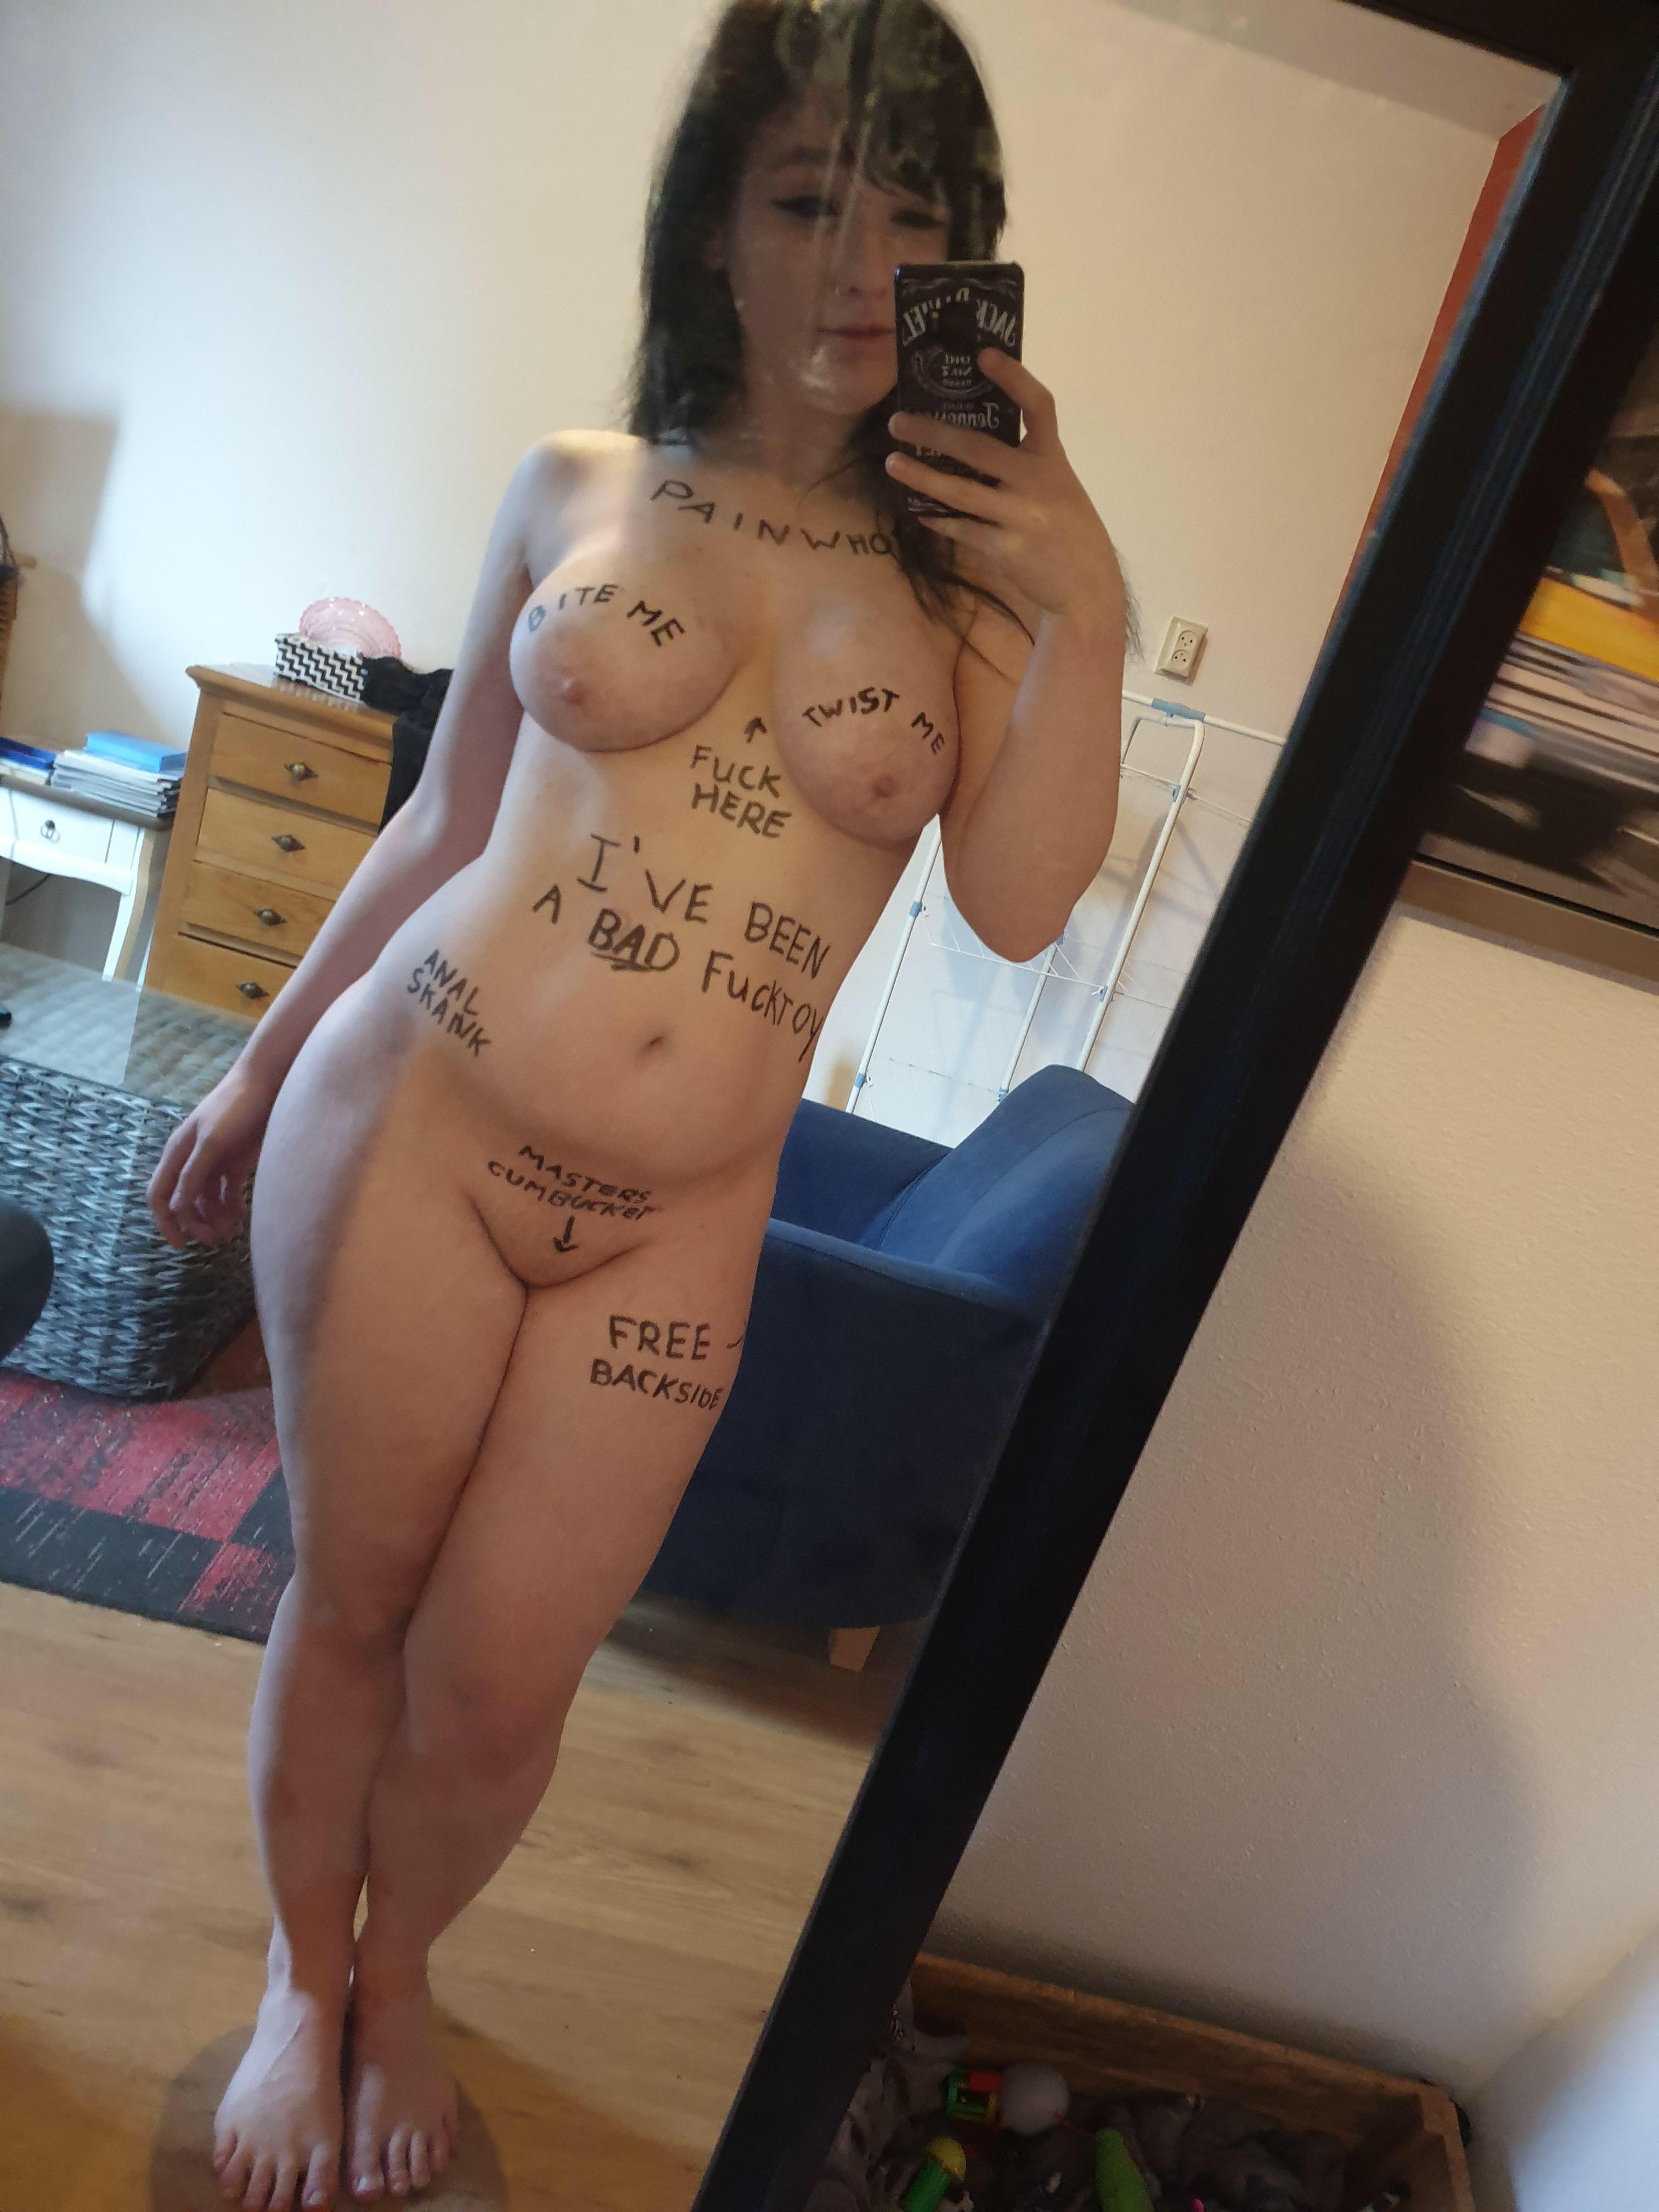 scp o jogo do capiroto jogos #Tits #BigTits #Writing #Lewd #Horny #Slutty #Pussy #SmoothPussy #Teen #Brunette #Naked #Selfshot #MirrorShot #Submissive